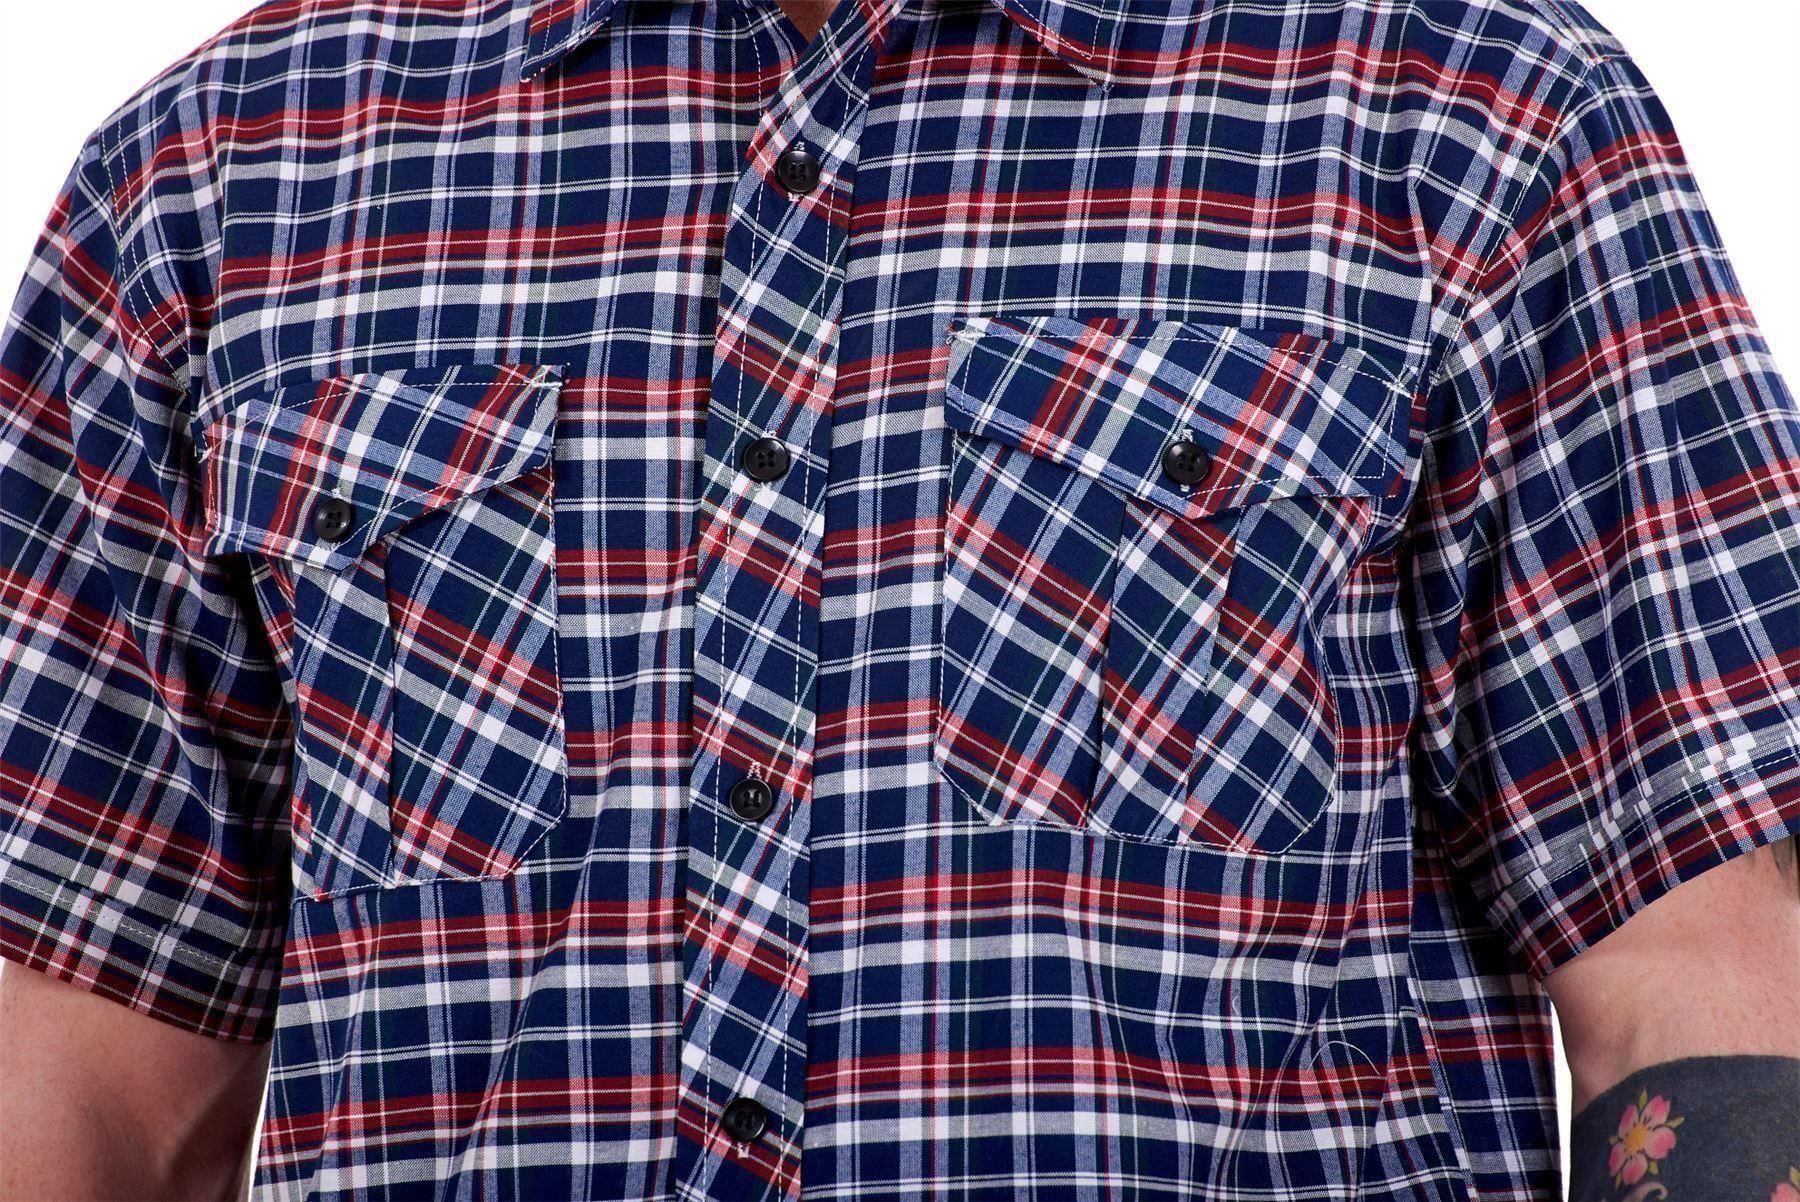 Mens-Regular-Big-Size-Shirts-Checked-Cotton-Blend-Casual-Short-Sleeve-M-to-5XL thumbnail 21